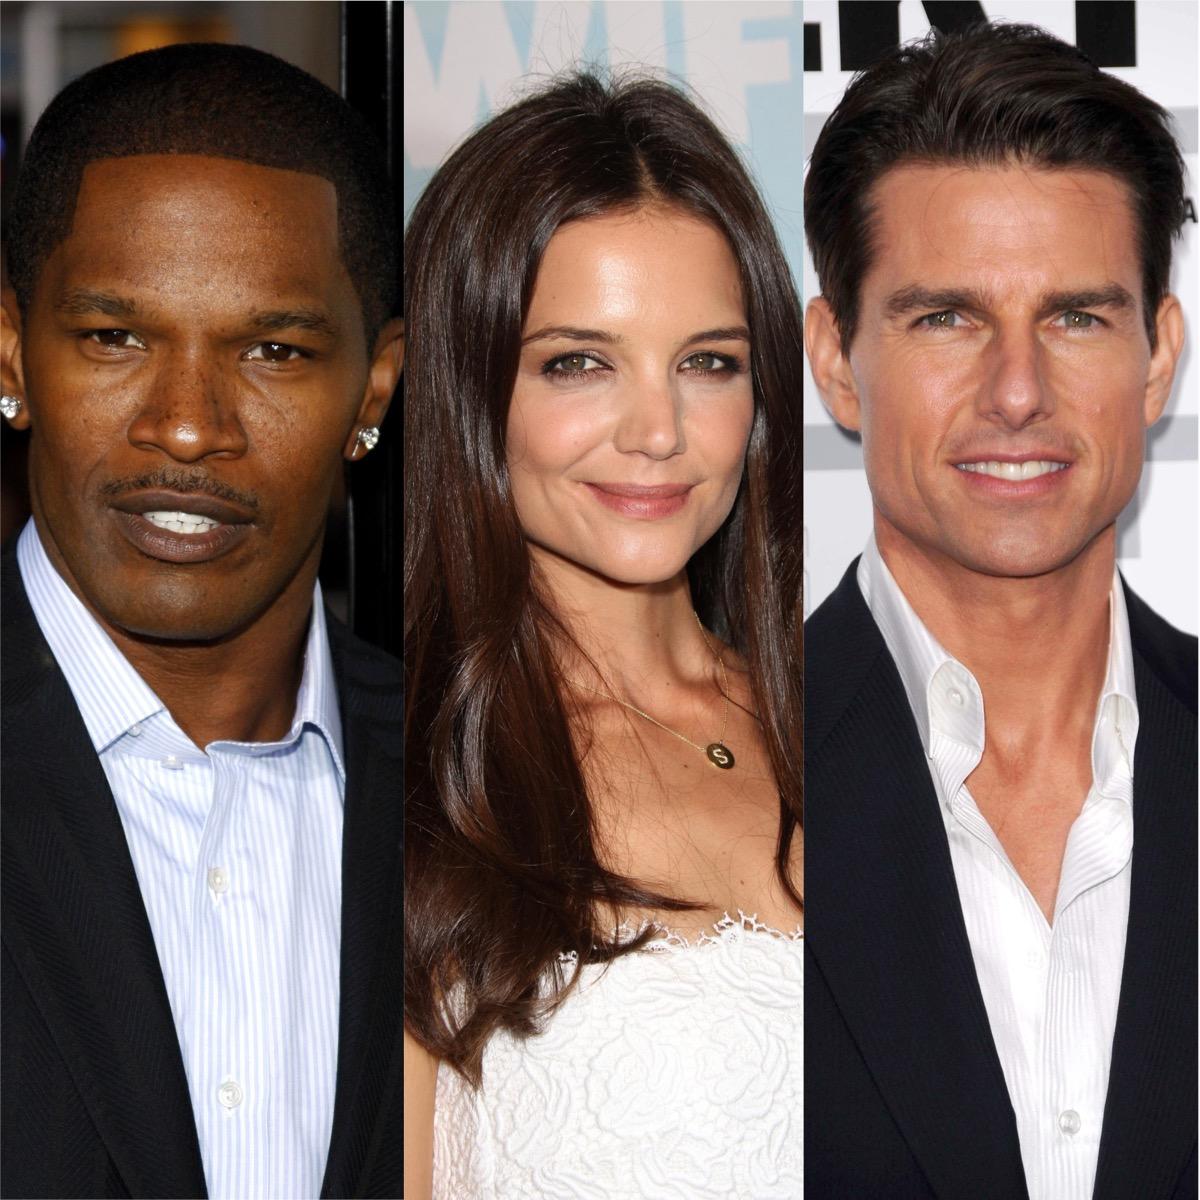 Jamie Foxx, Katie Holmes, and Tom Cruise